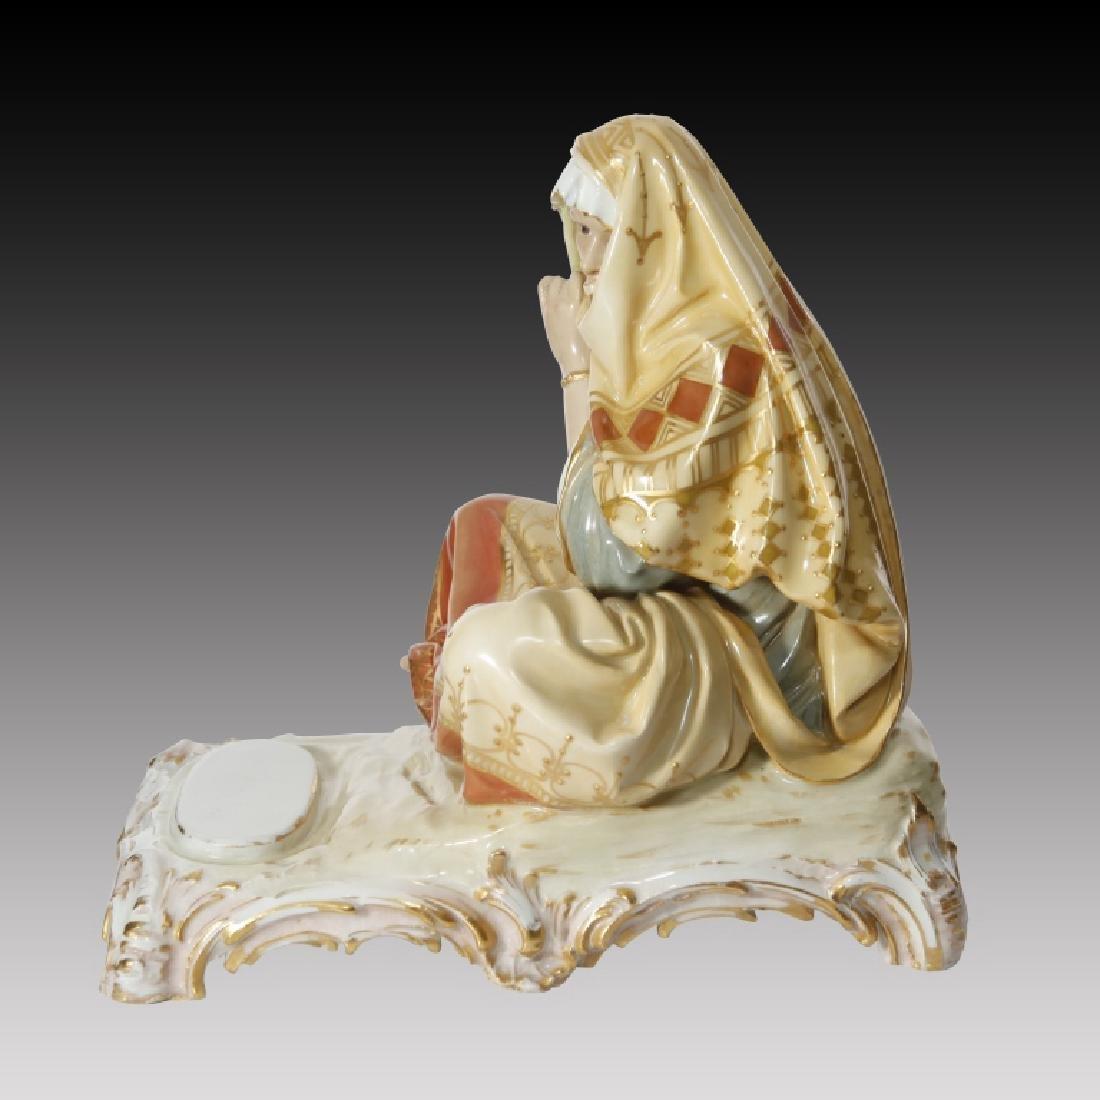 KPM Polychrome Figure of Woman in Arab Costume - 2